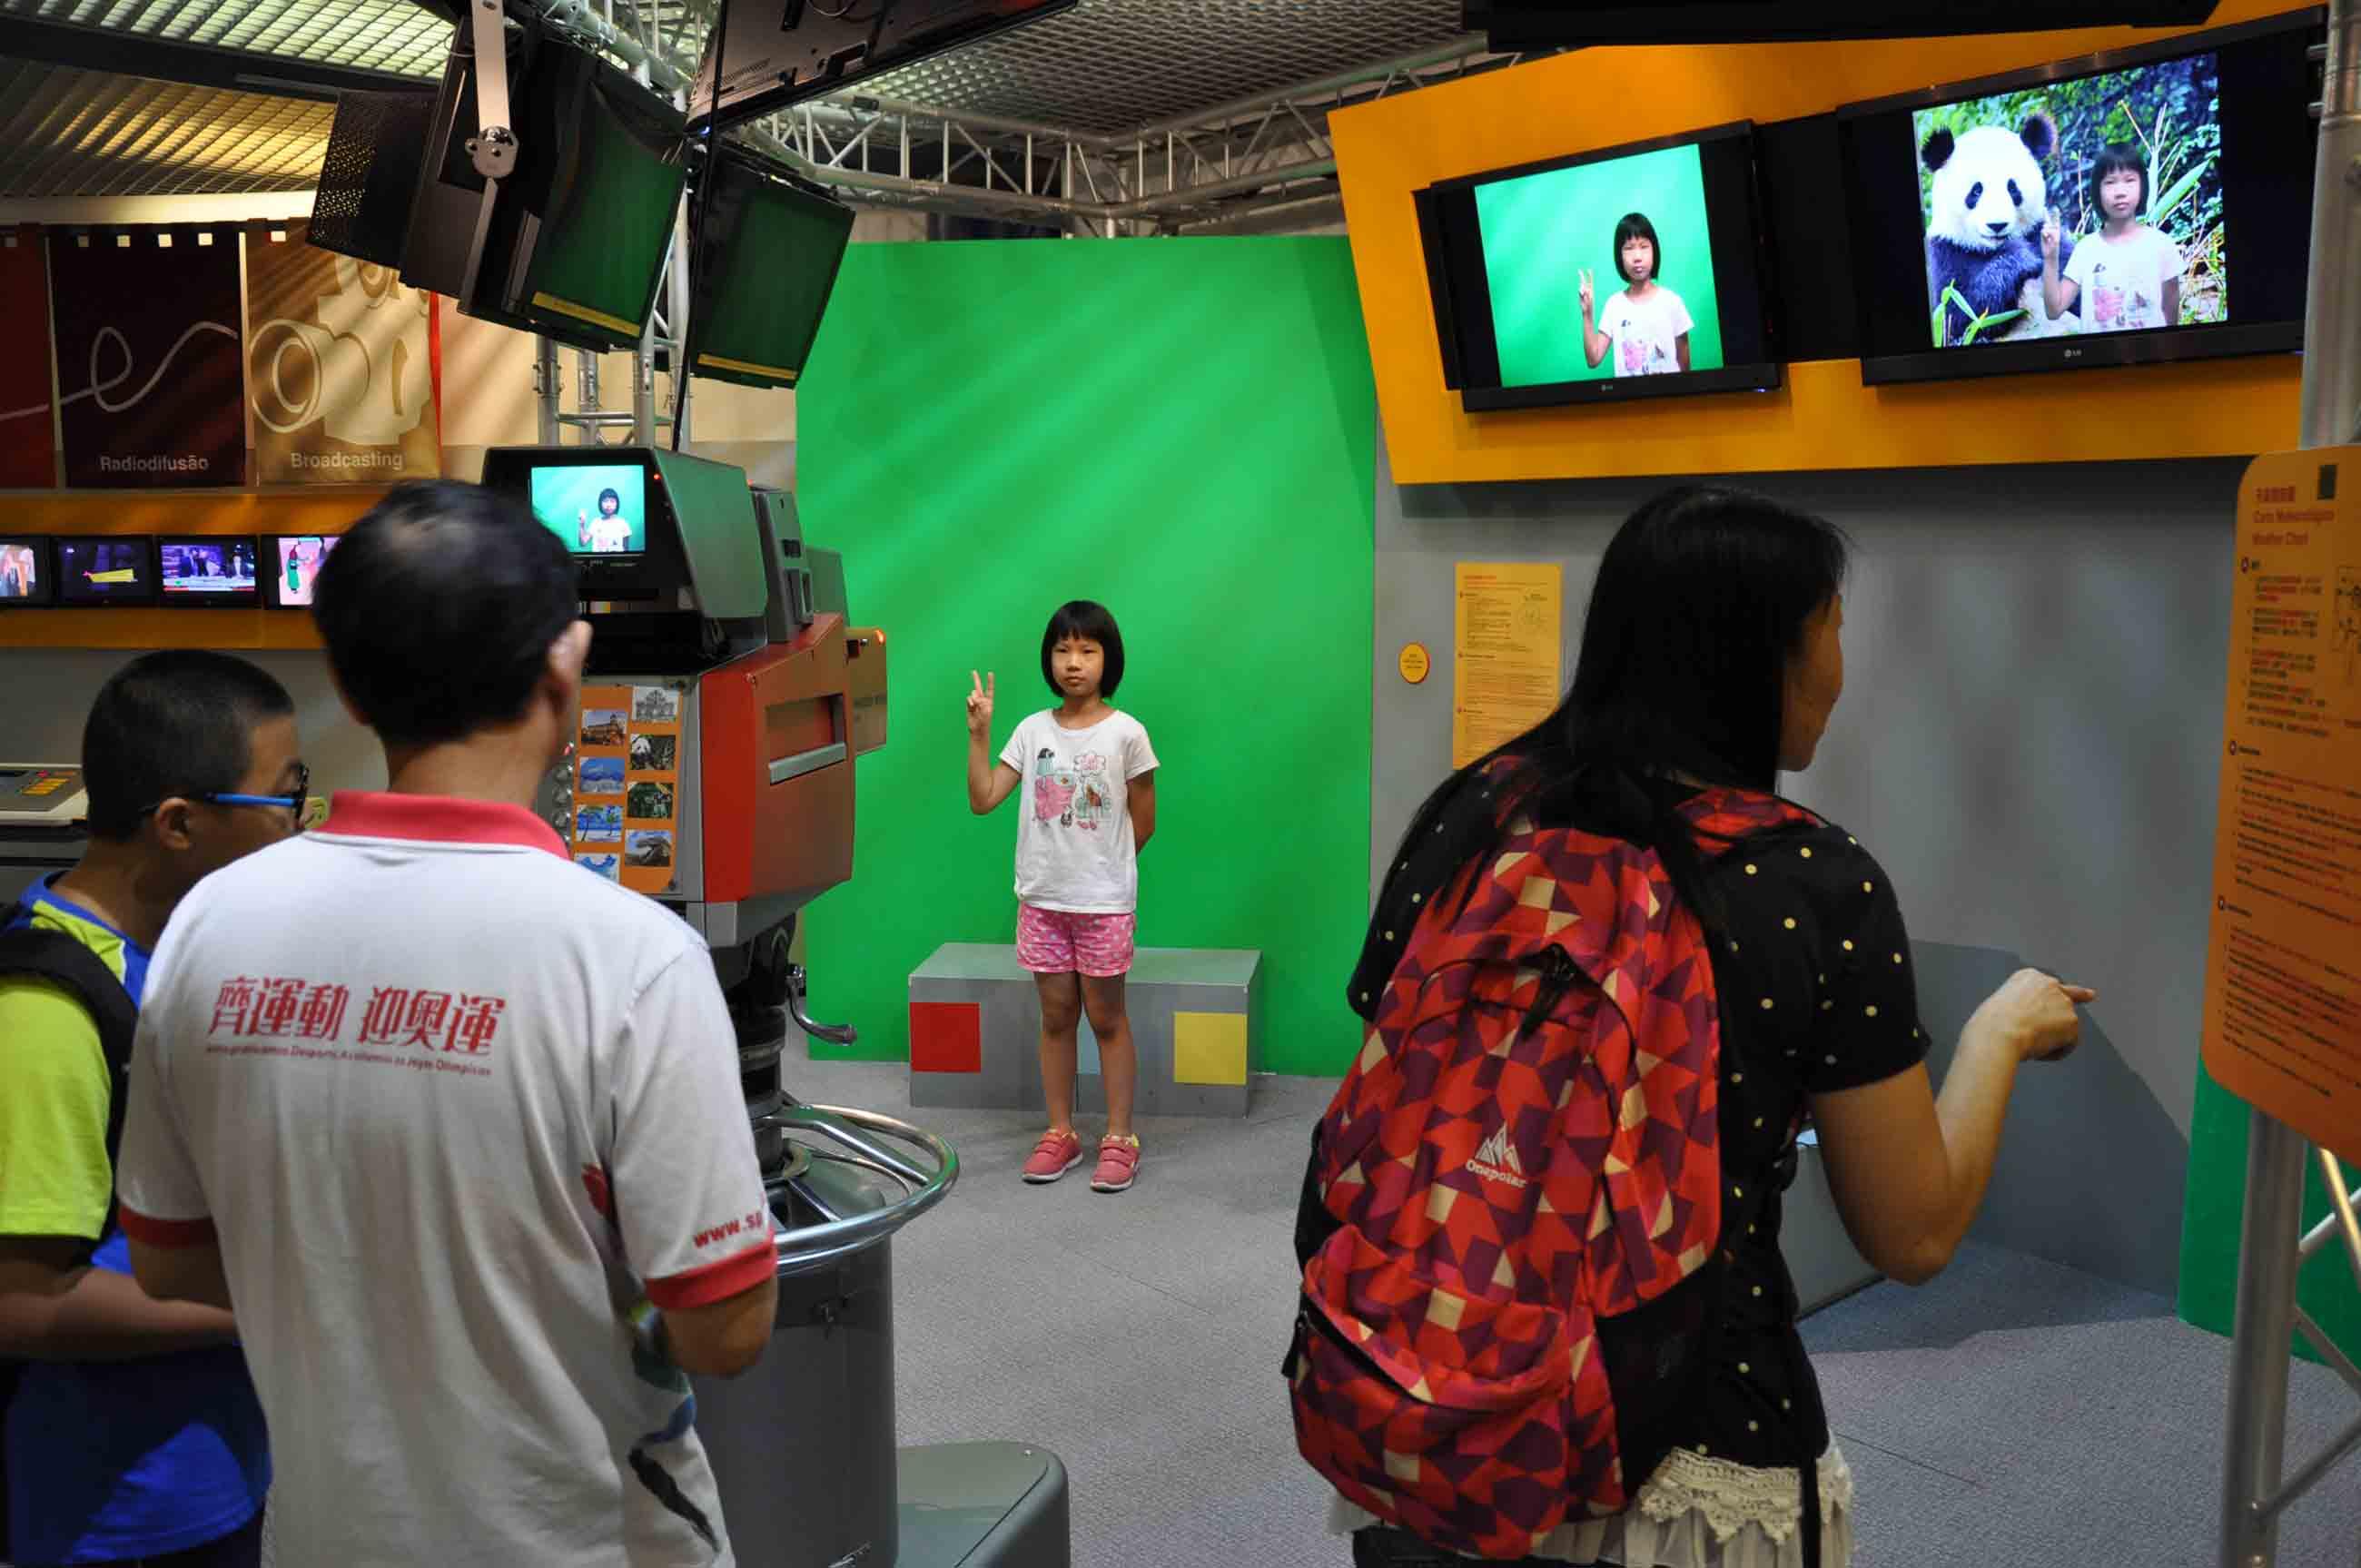 Communications Museum Macau